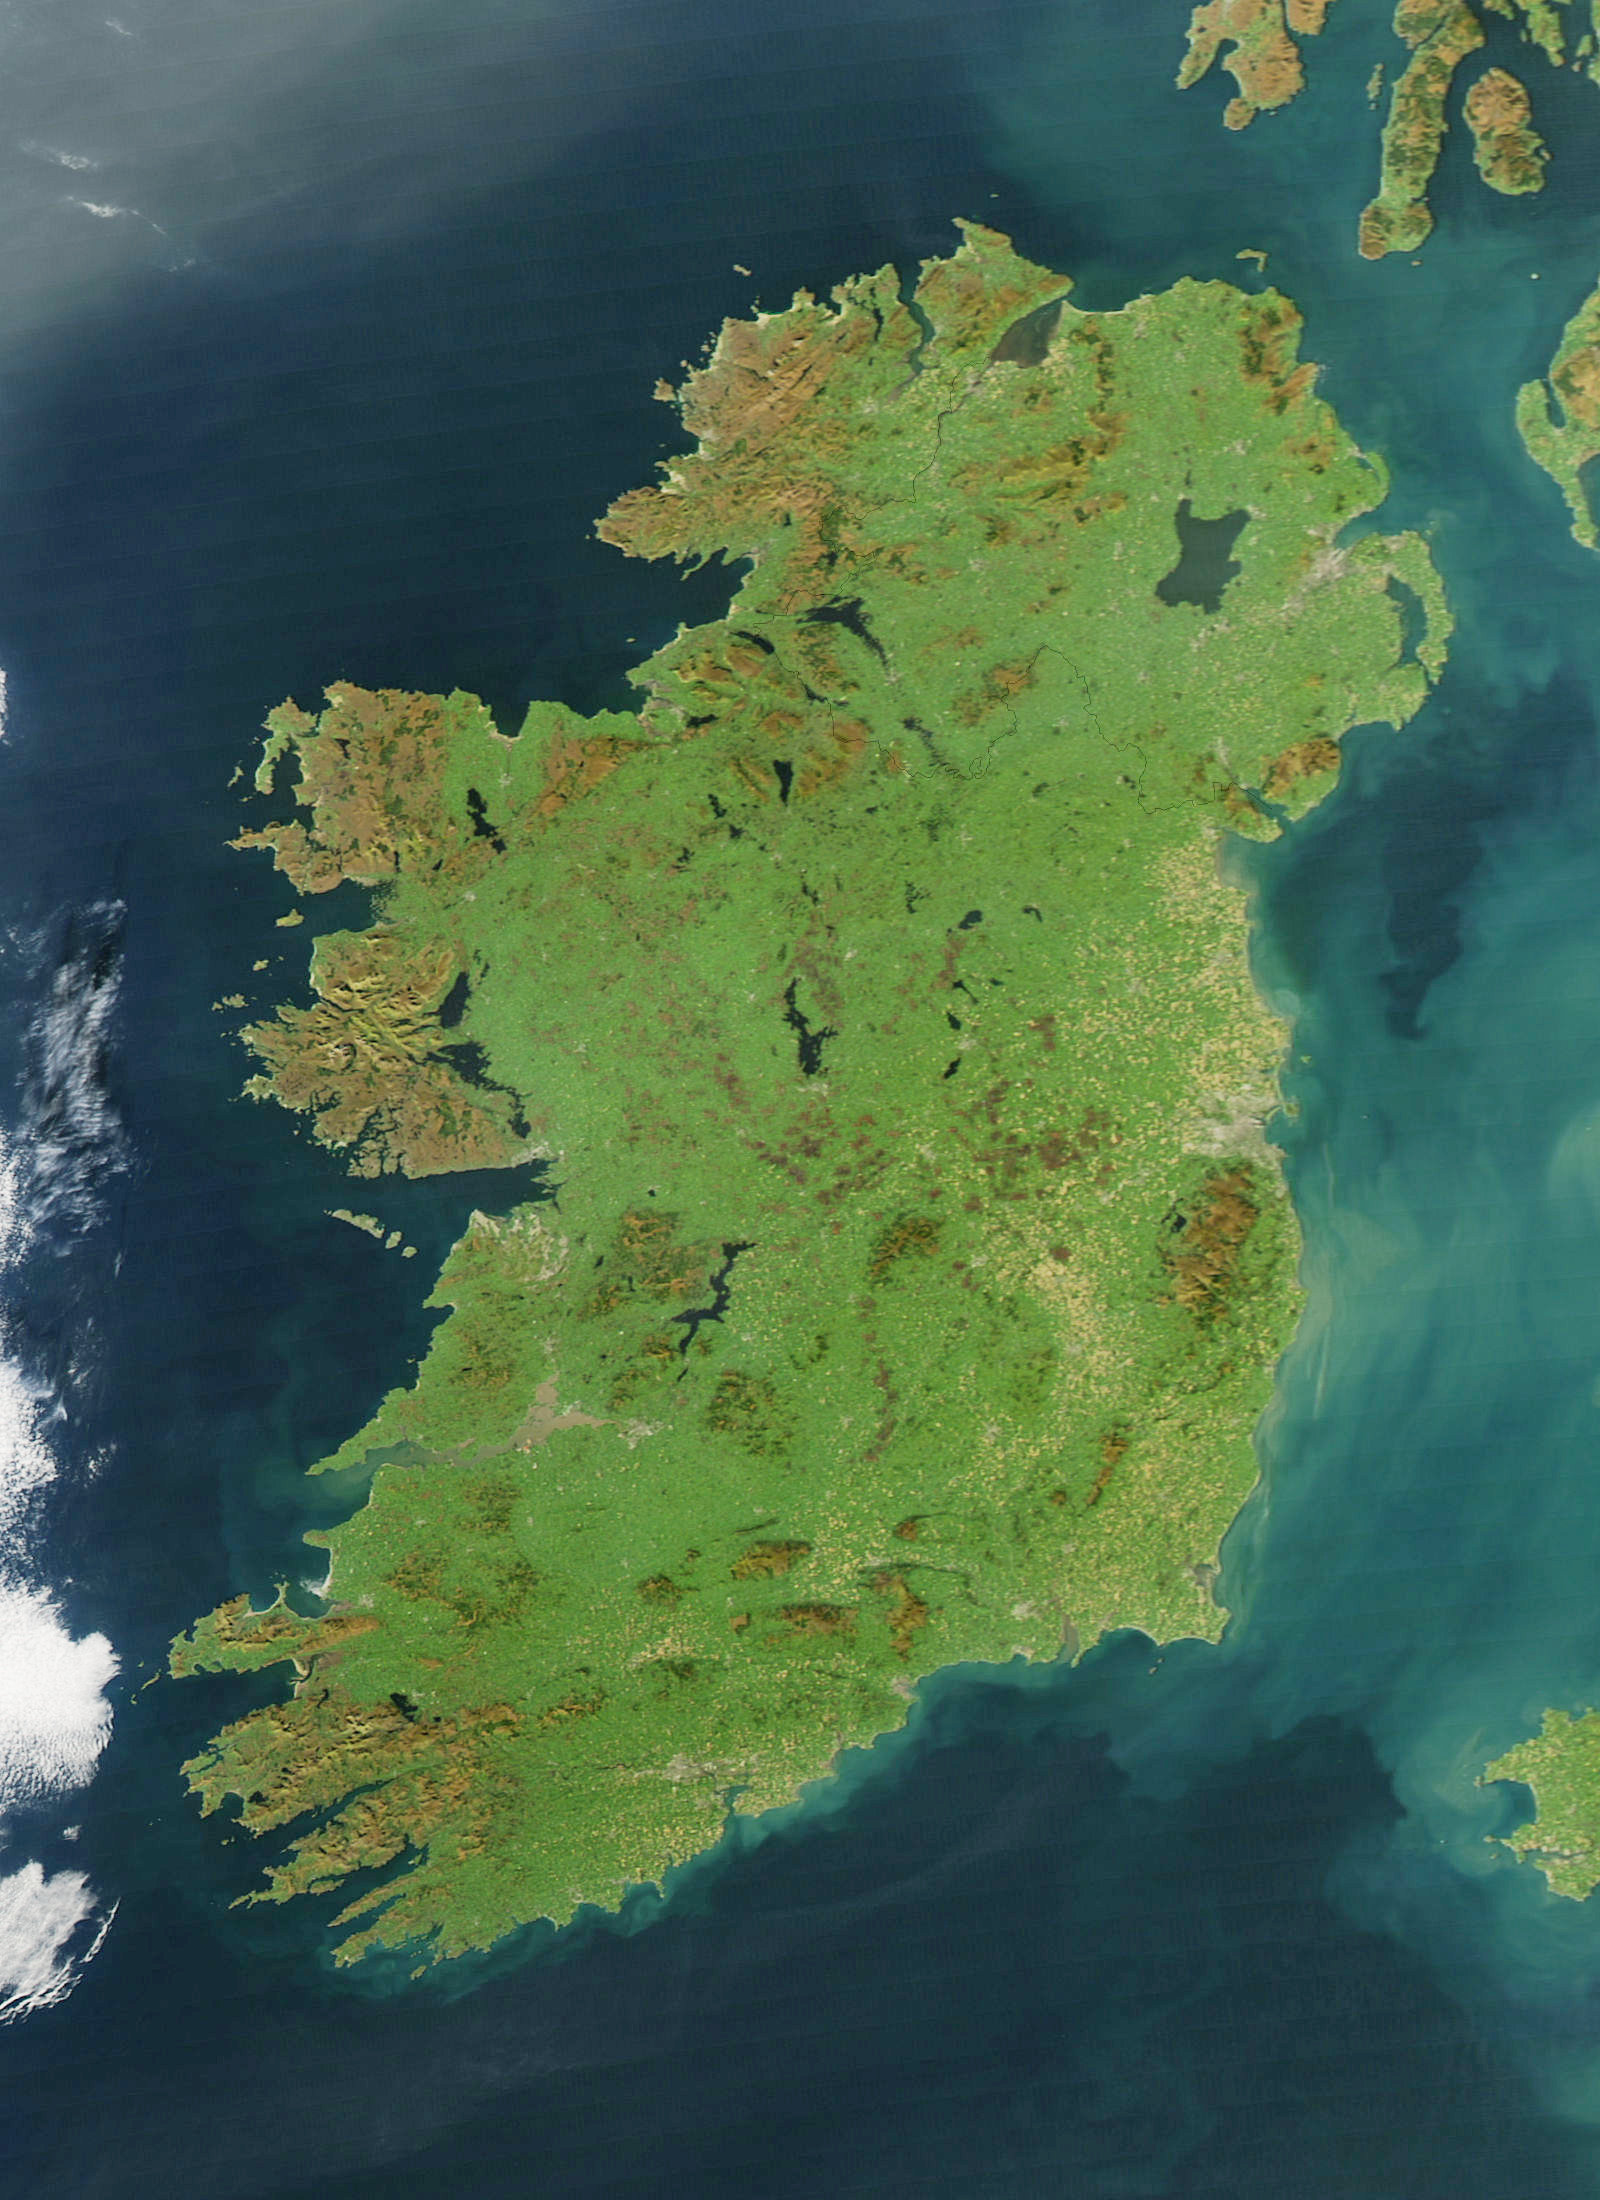 NASA satellite image of Ireland